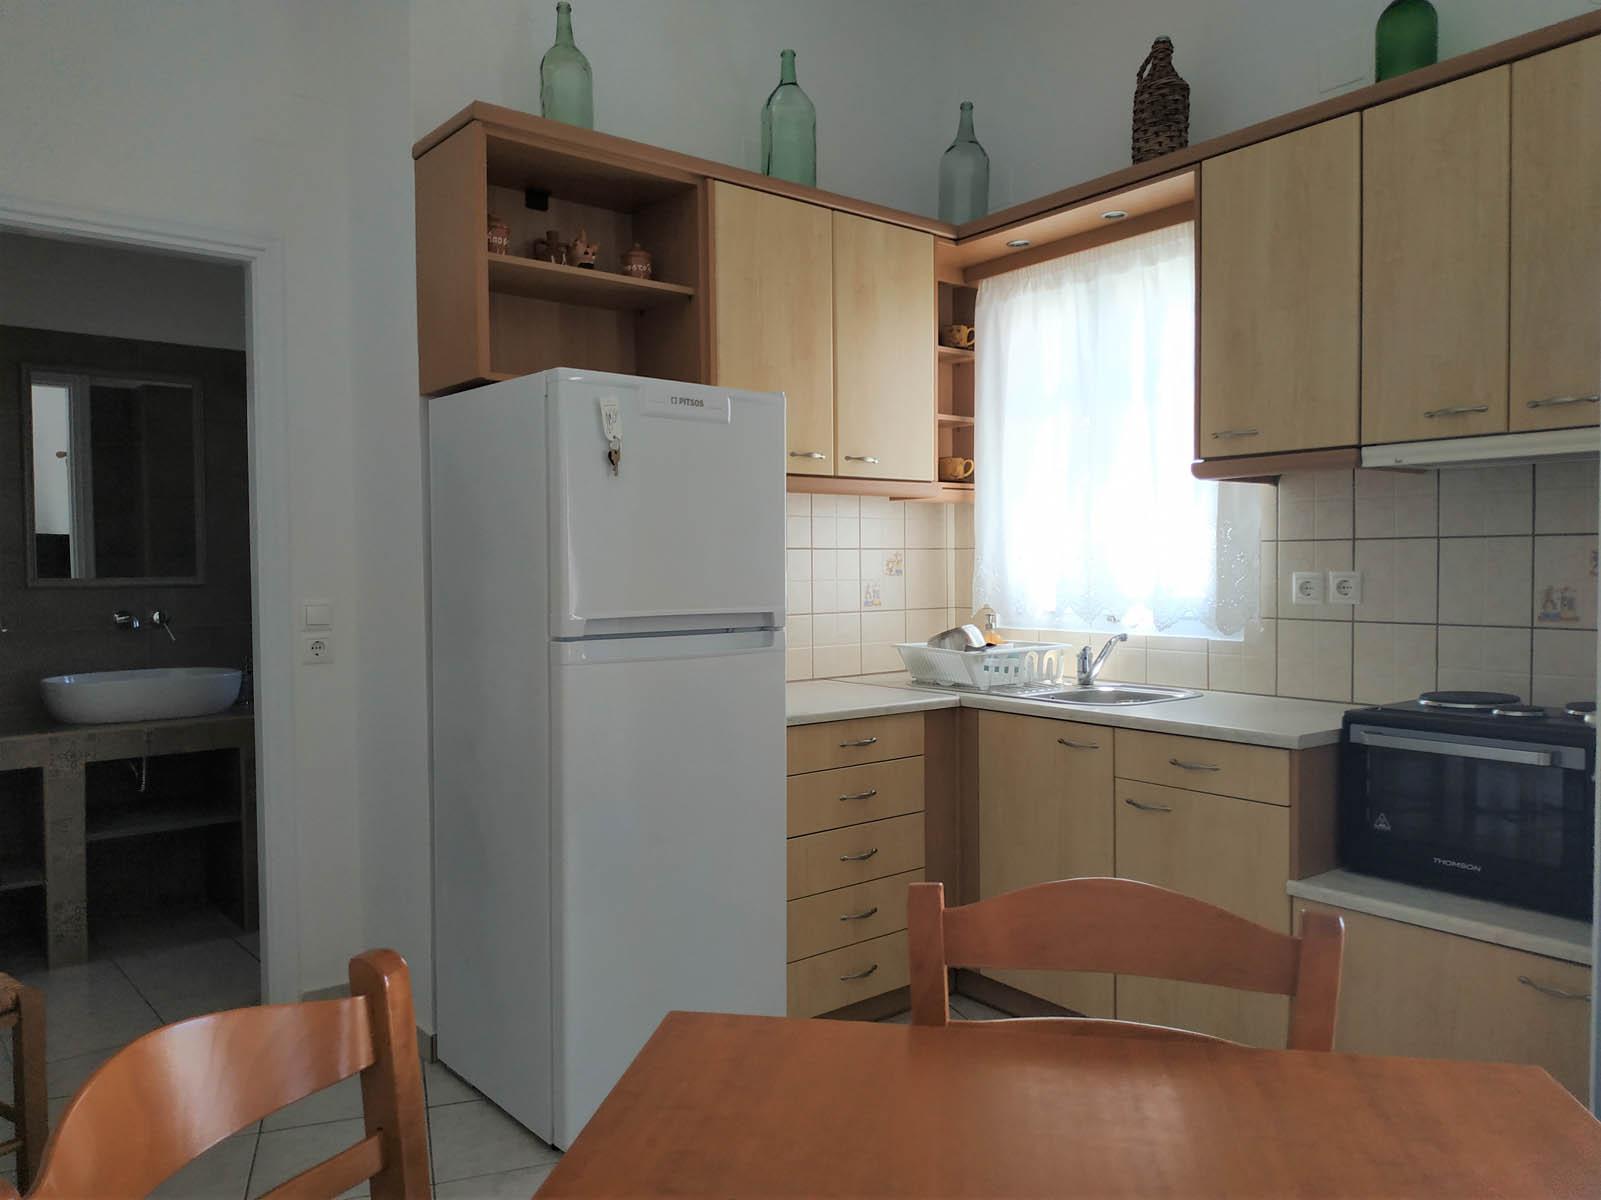 2bedroom apartment (9)